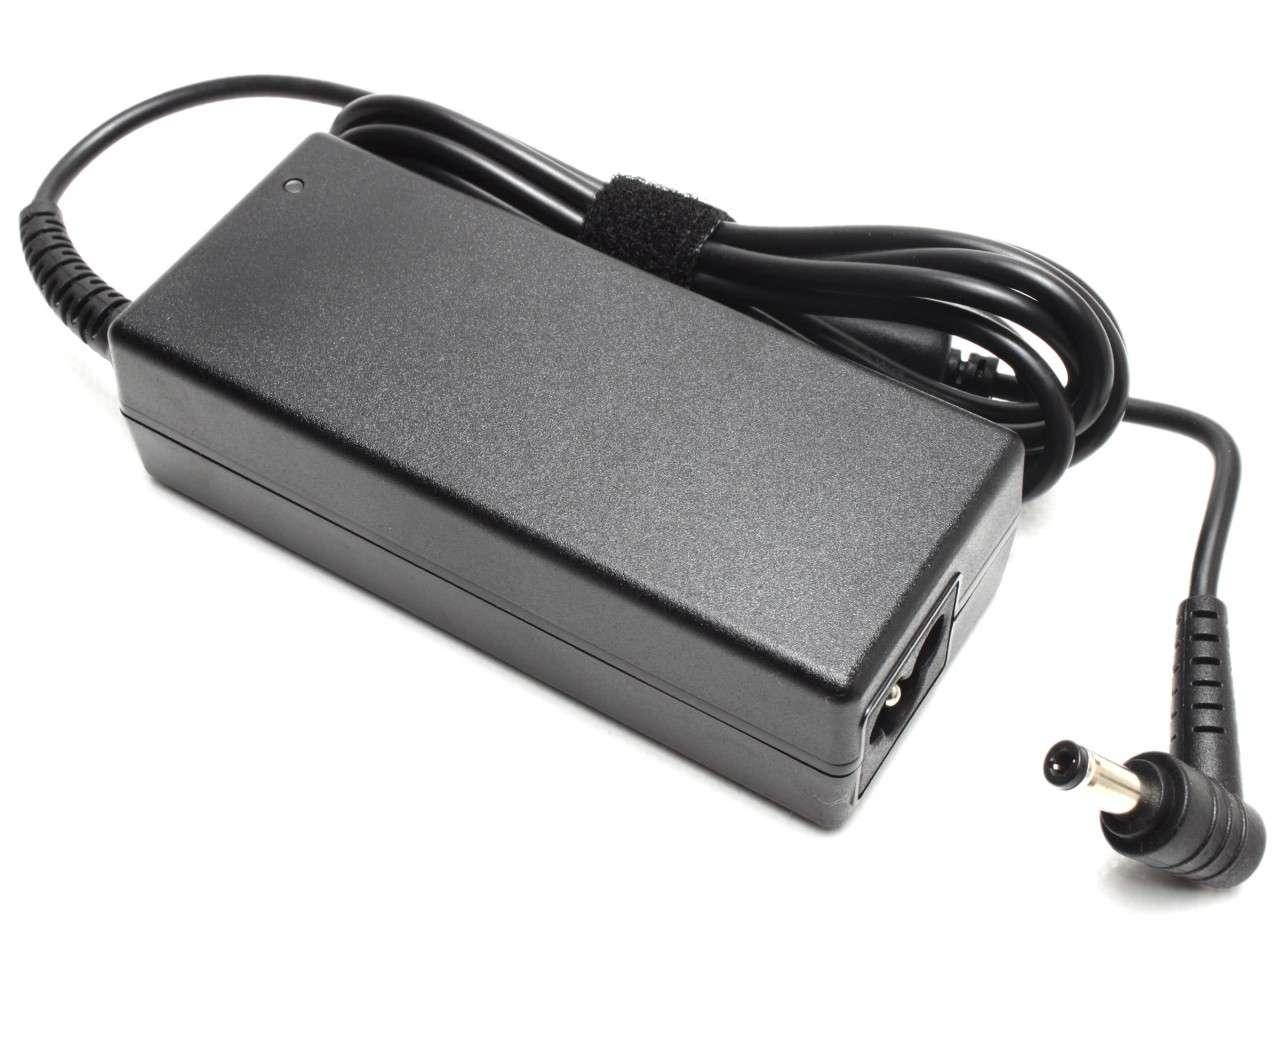 Incarcator Philips Freevents X61 imagine powerlaptop.ro 2021